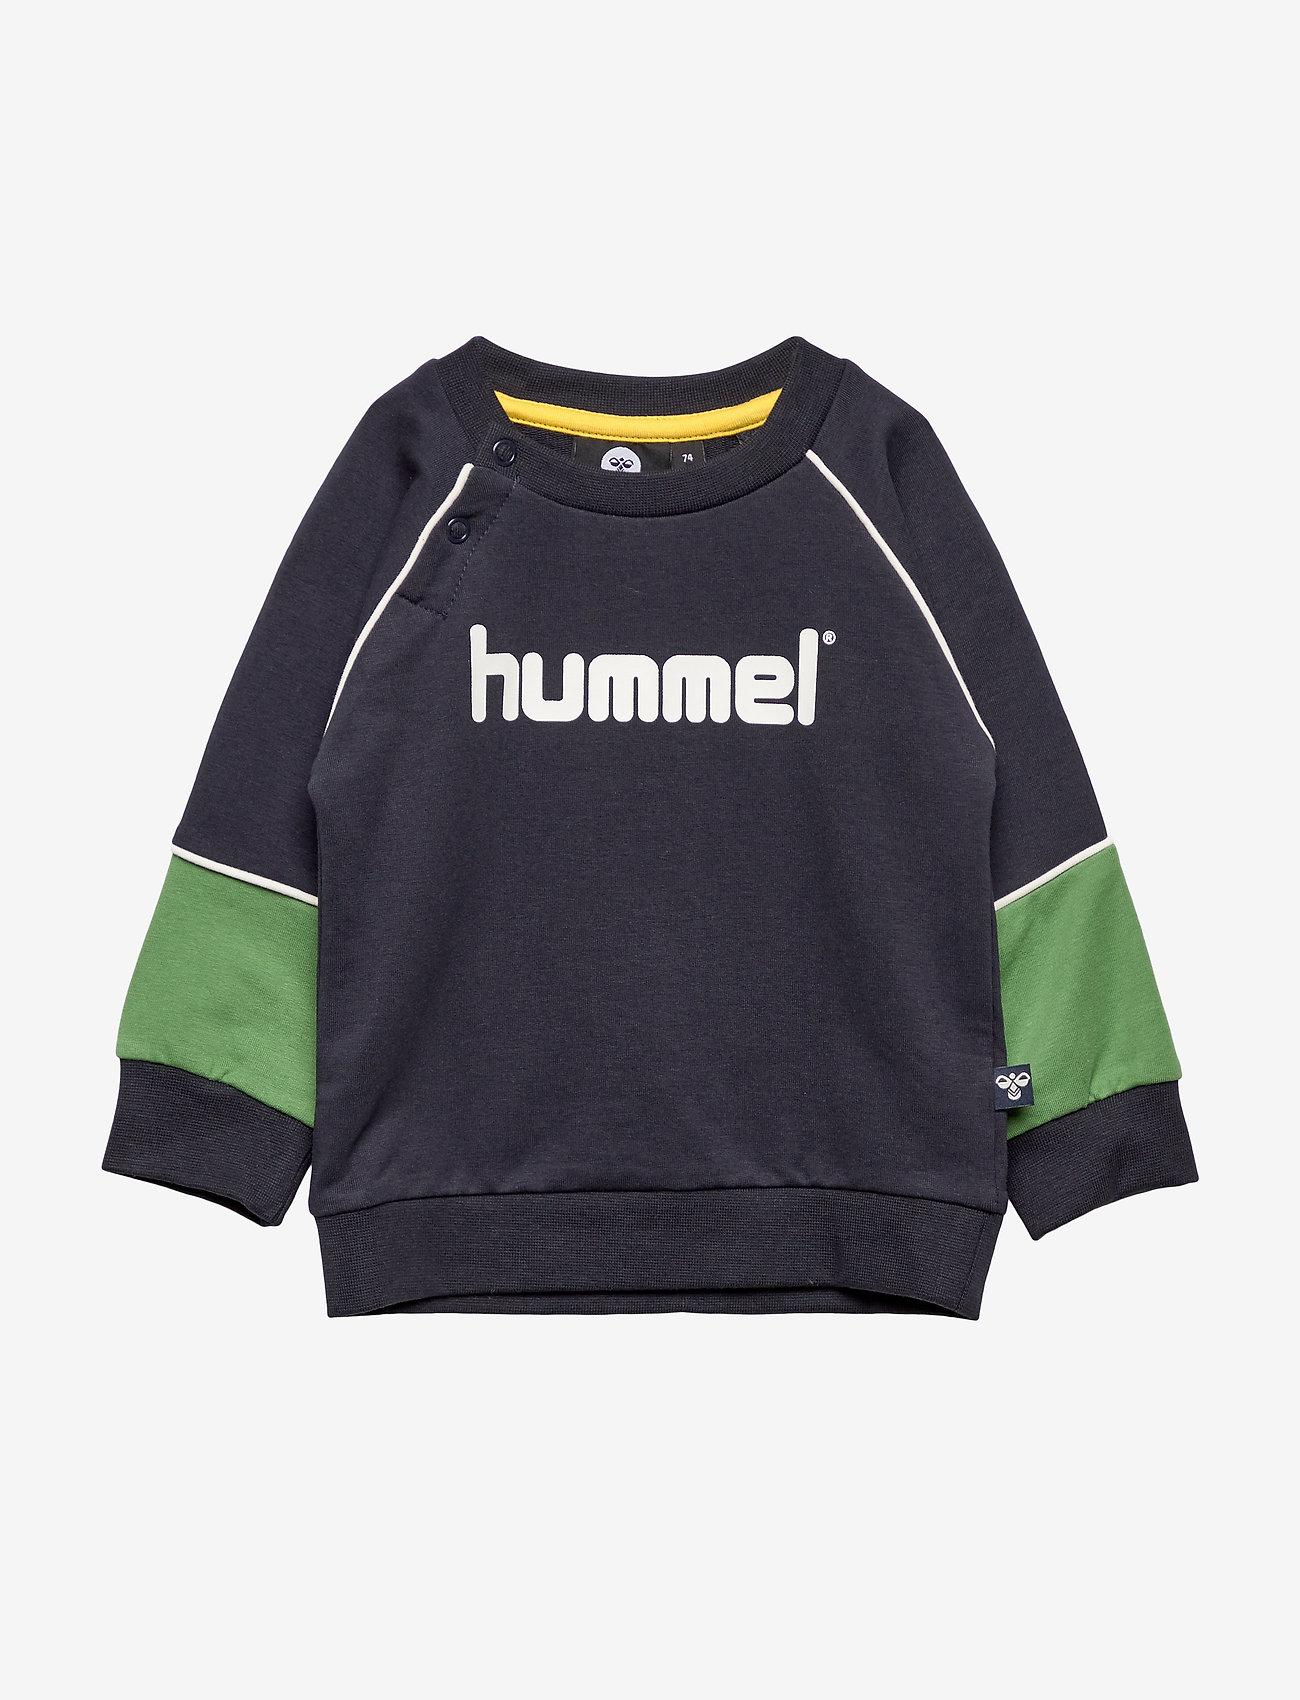 Hummel - hmlJET SWEATSHIRT - sweats - dark navy